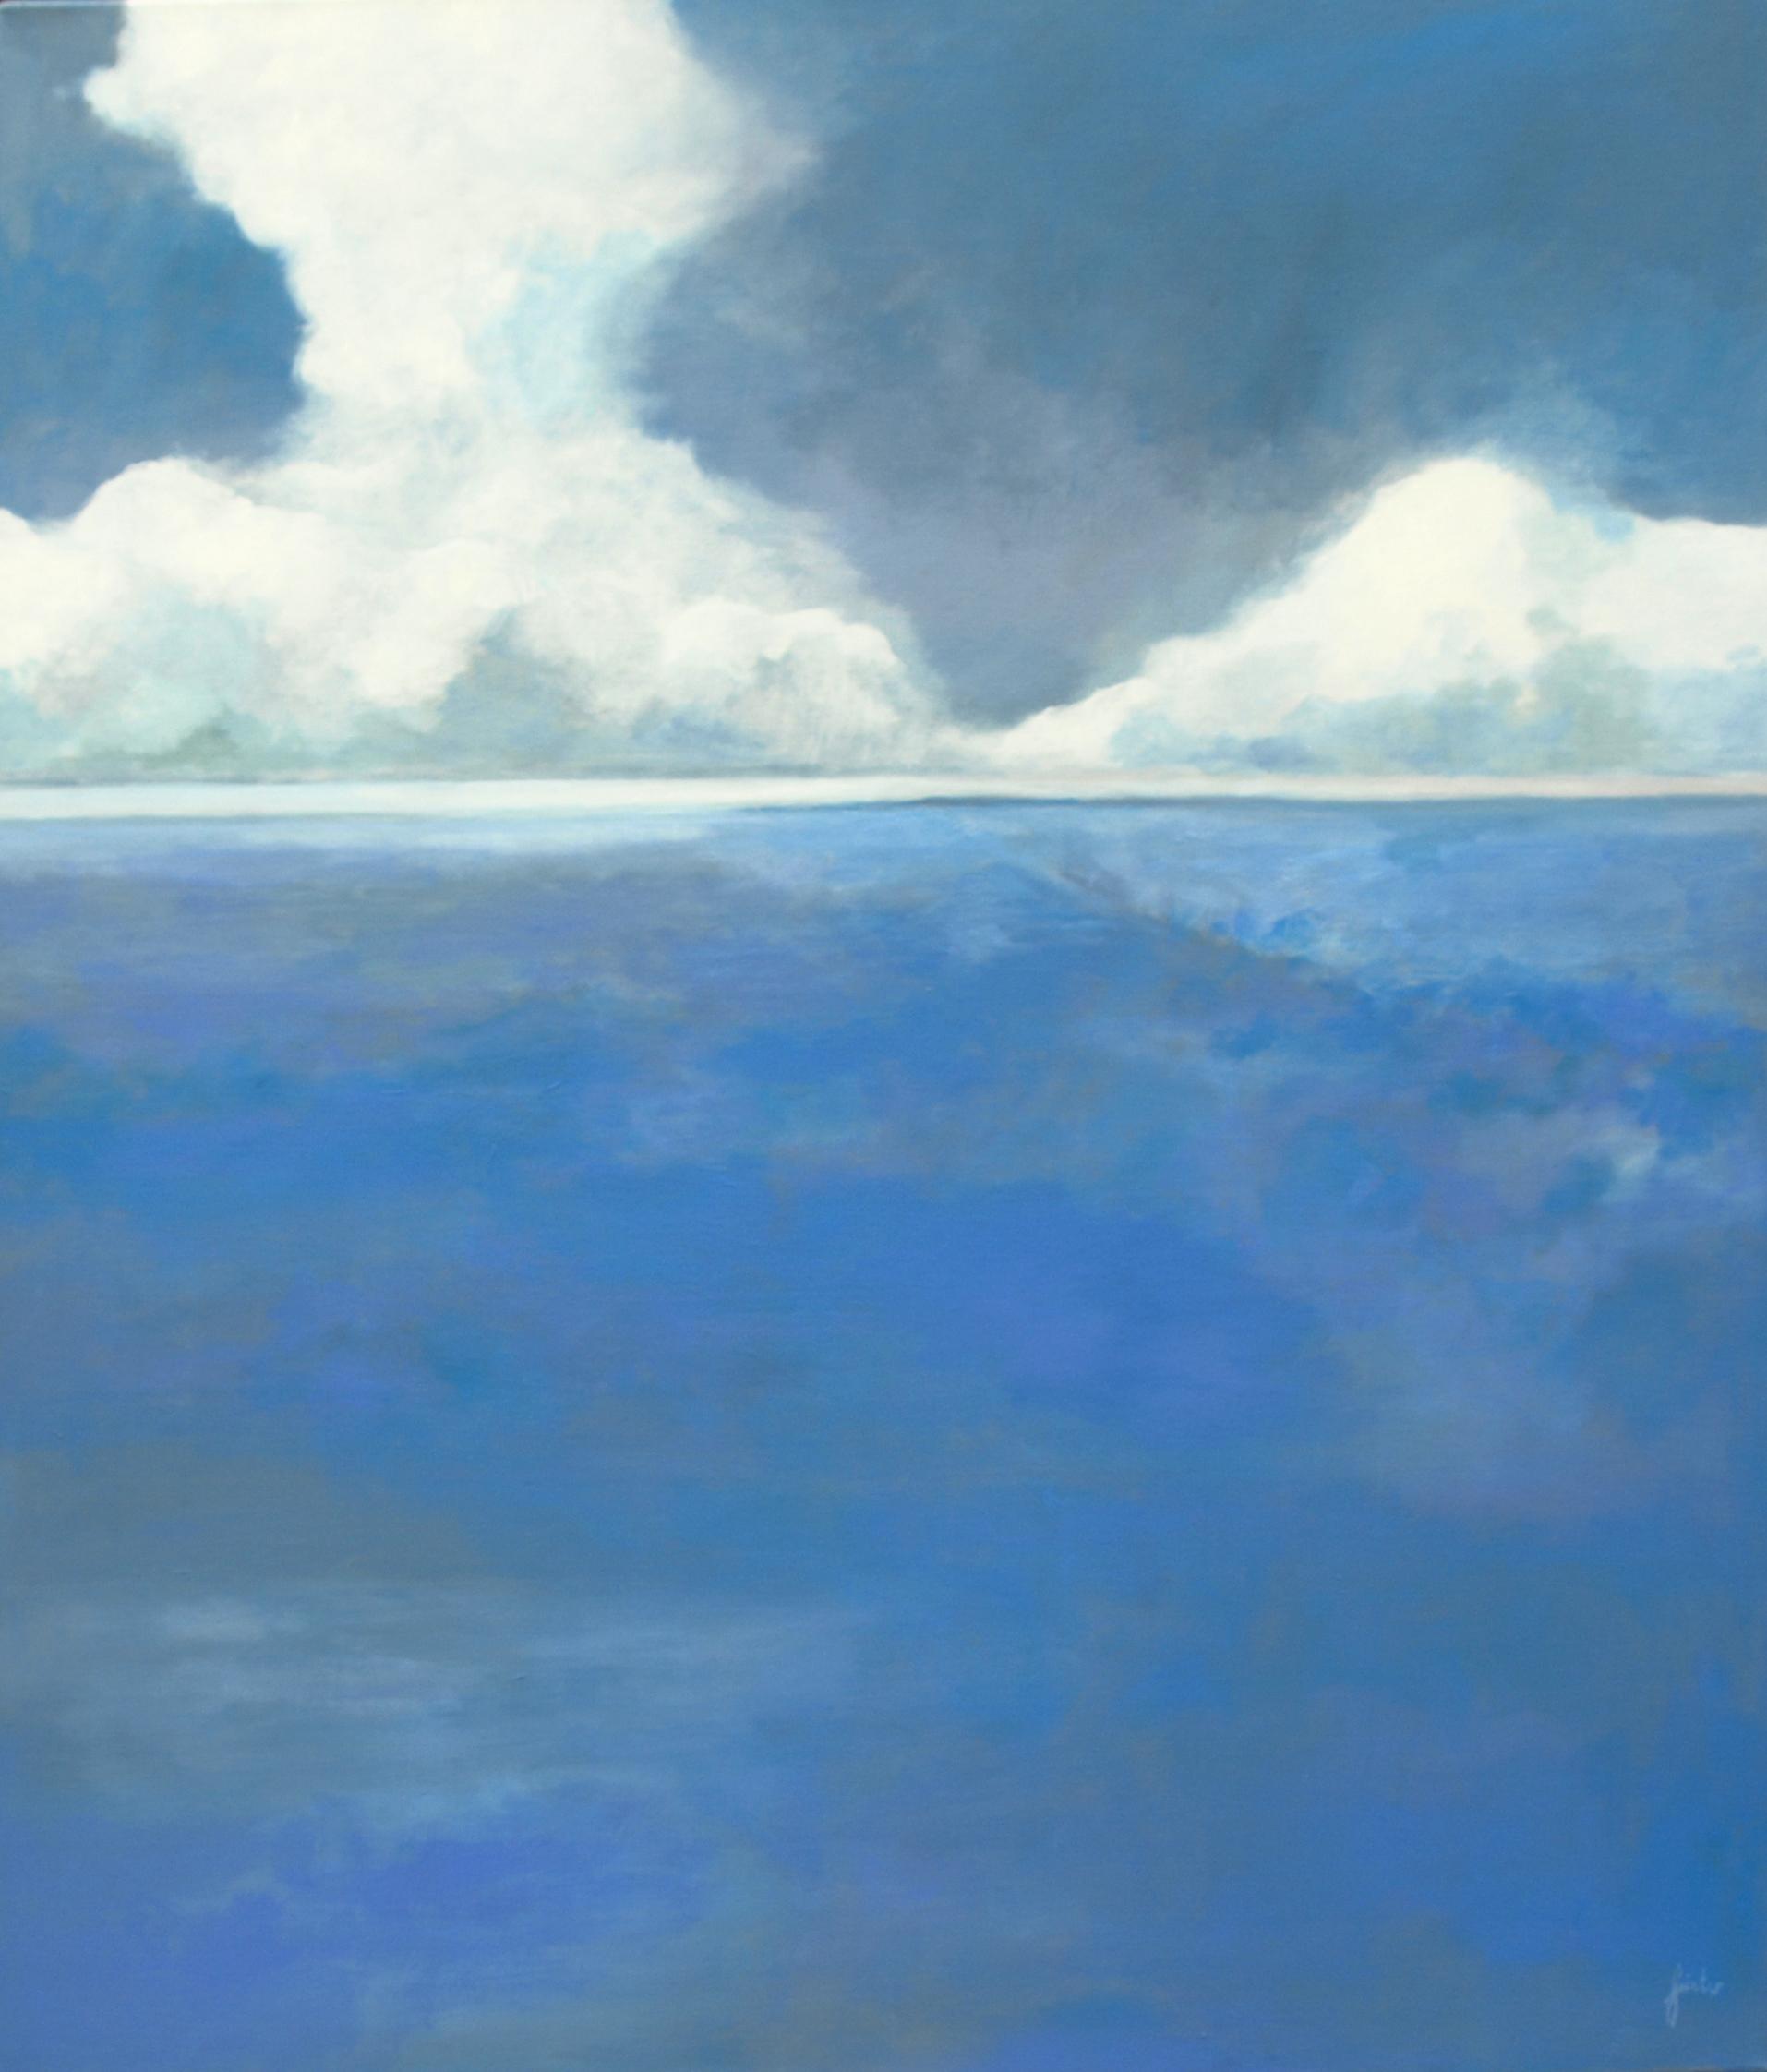 Himmel und Meer Acrylbild